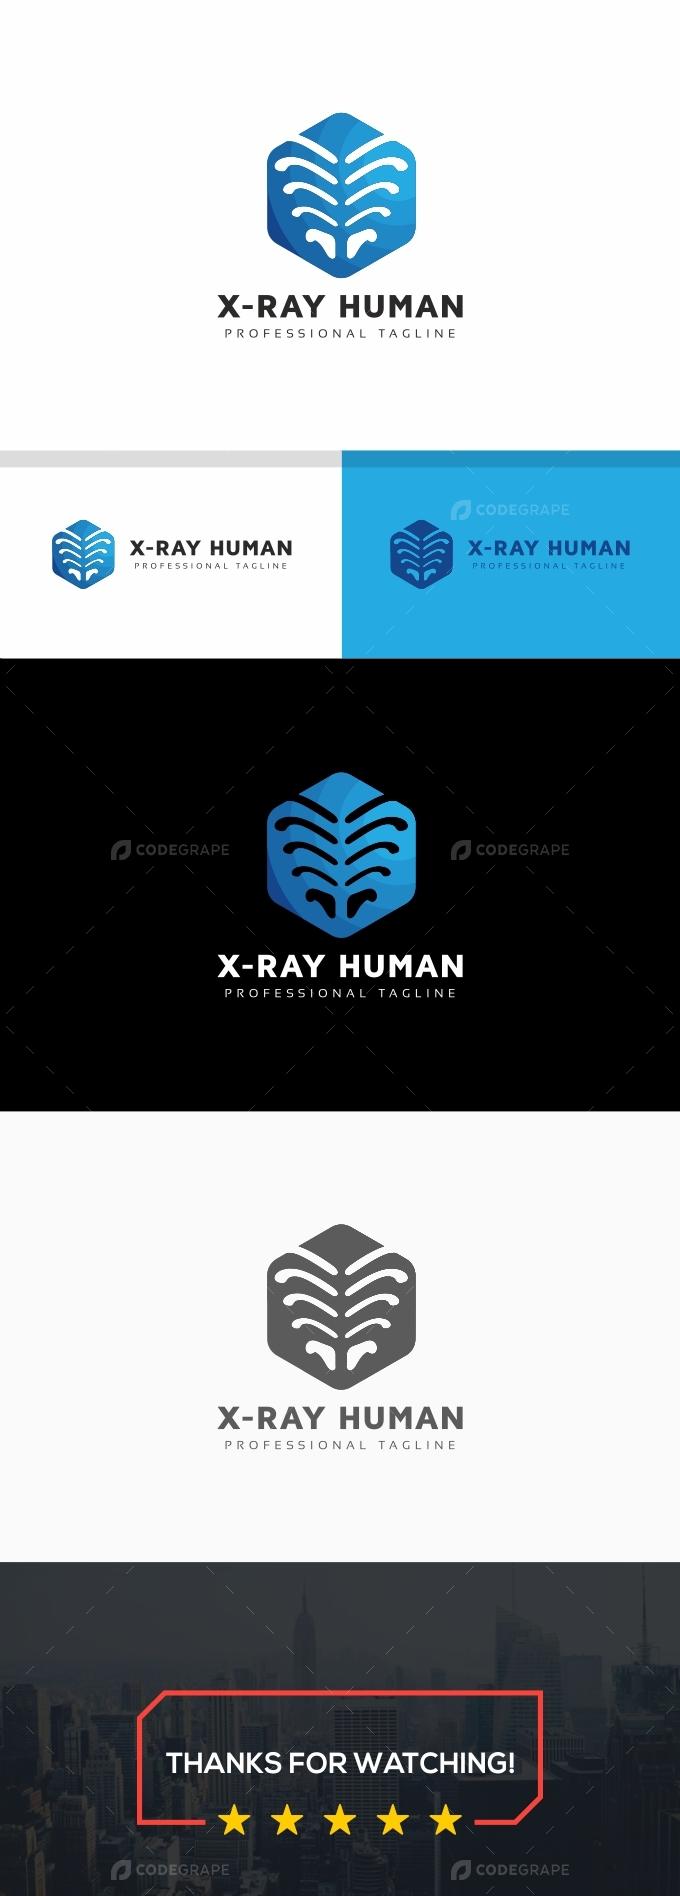 X-Ray Human Logo